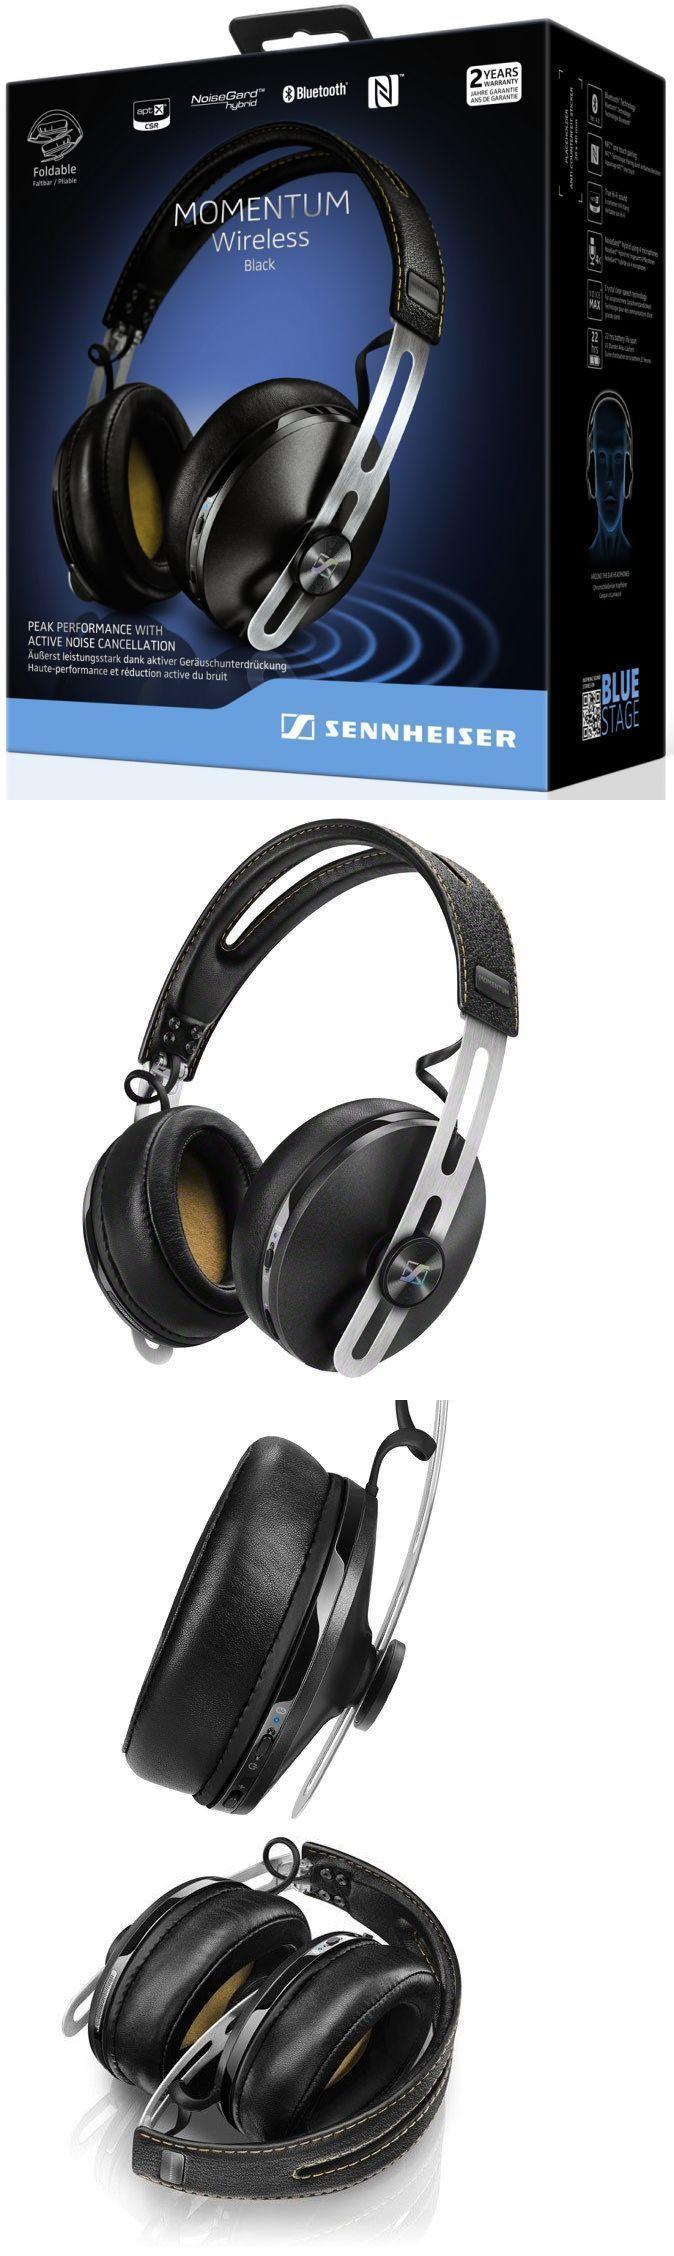 Headphones: Sennheiser Momentum 2.0 M2 Aebt Bluetooth Wireless Headphones Full 2-Yr Warranty -> BUY IT NOW ONLY: $269 on eBay!